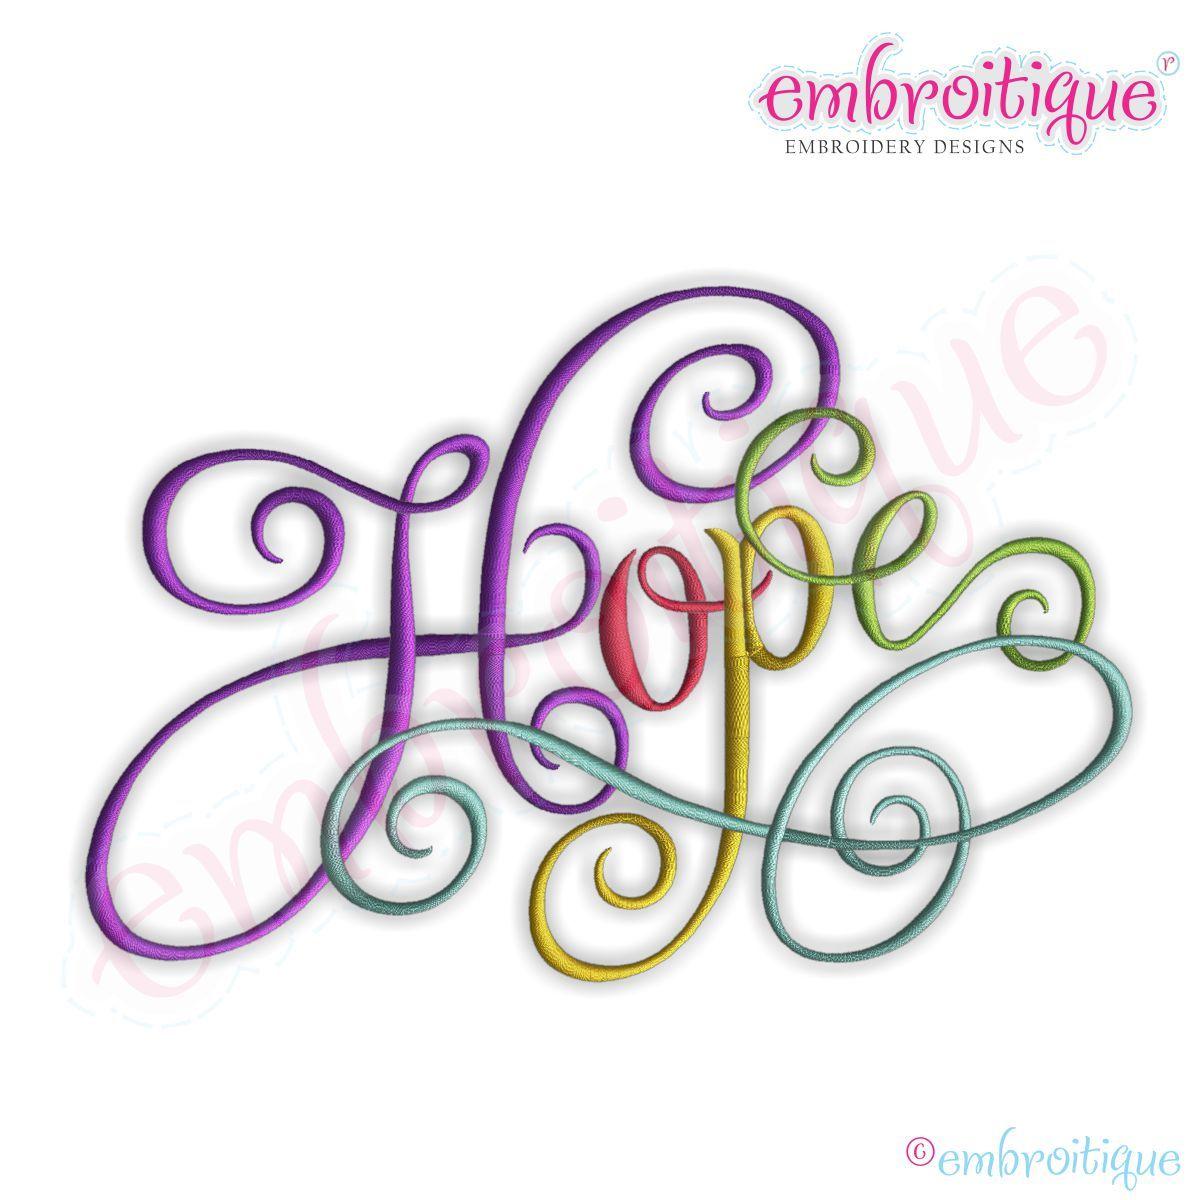 Applique Corner Applique Design, embroidery font One Hope ...